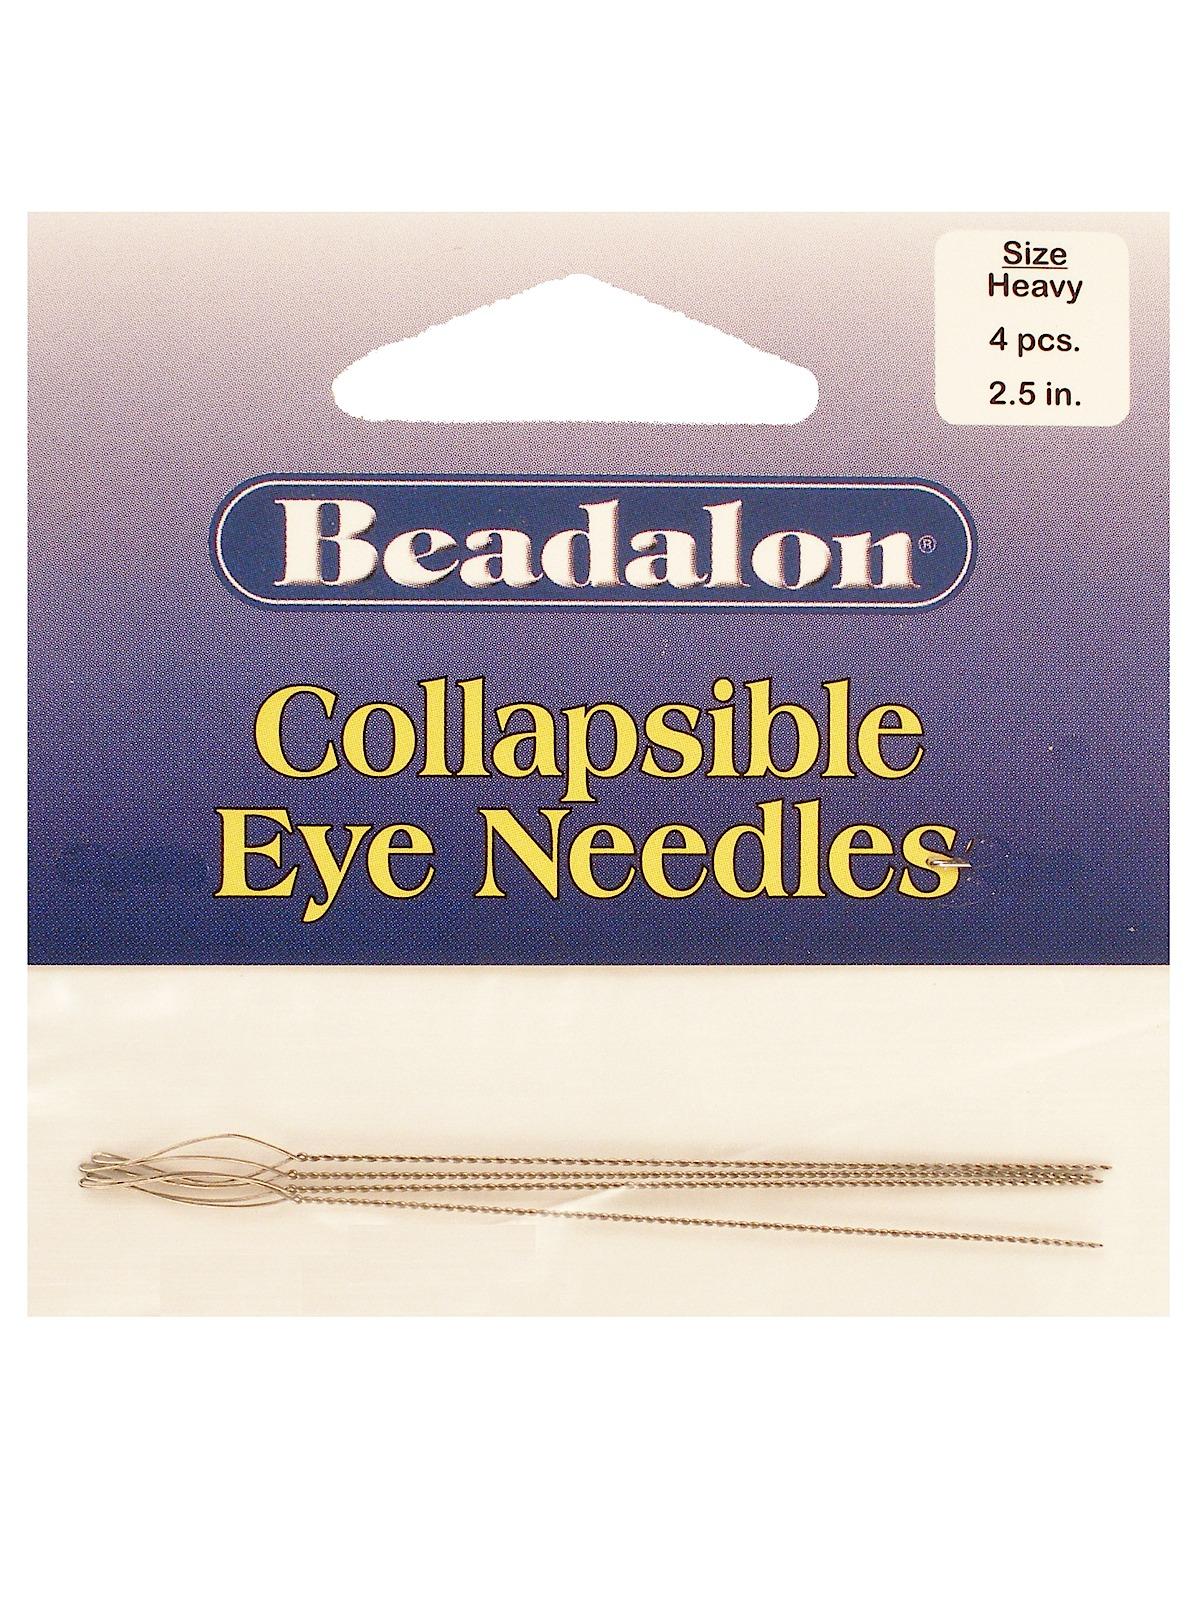 Where To Buy Beadalon Collapsible Eye Needles 86